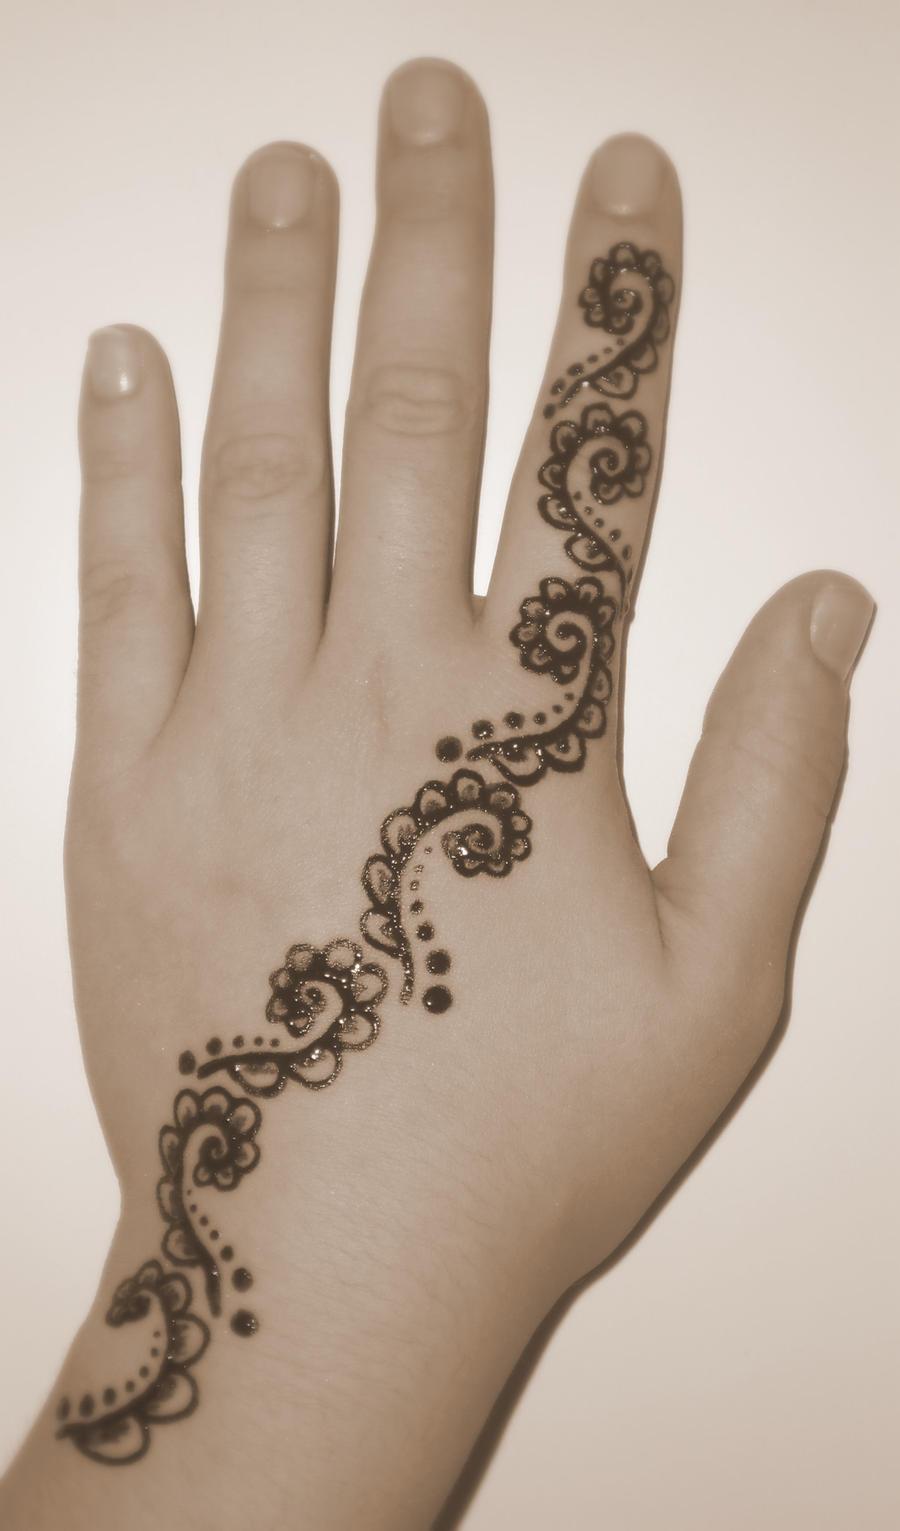 henna tattoo by silentcry89 on deviantart. Black Bedroom Furniture Sets. Home Design Ideas